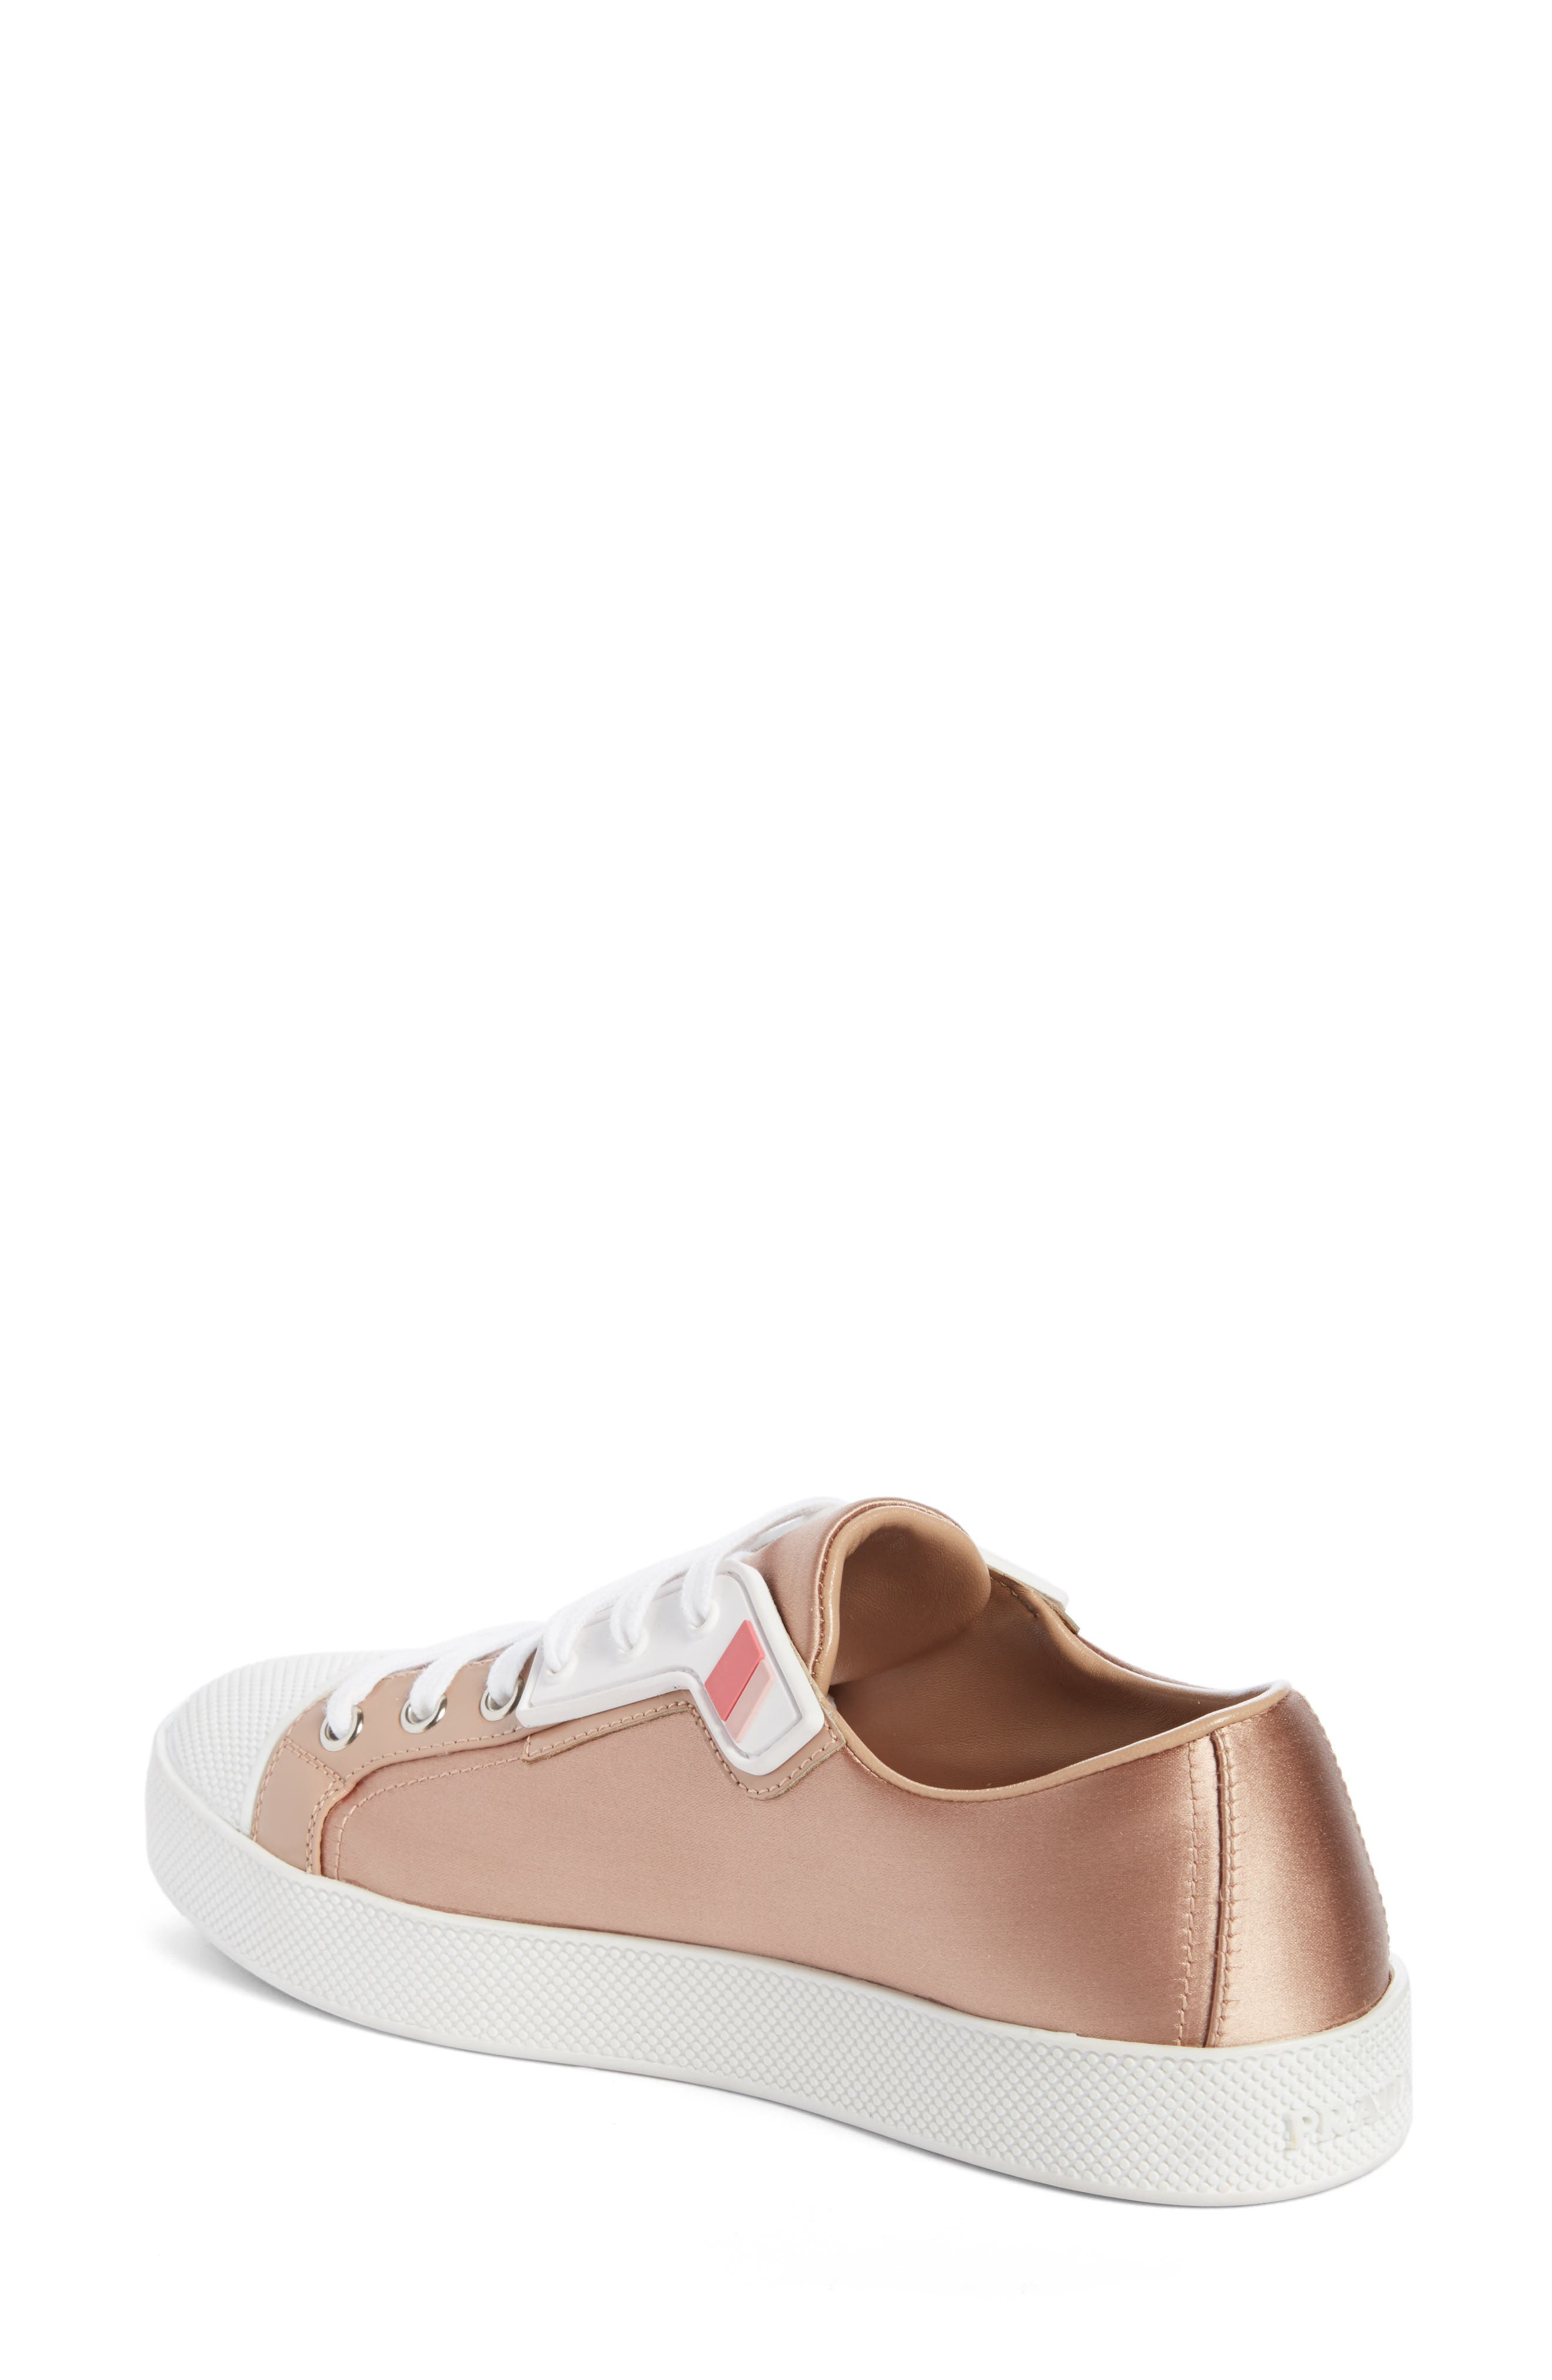 Alternate Image 2  - Prada Linea Rossa Platform Sneaker (Women)